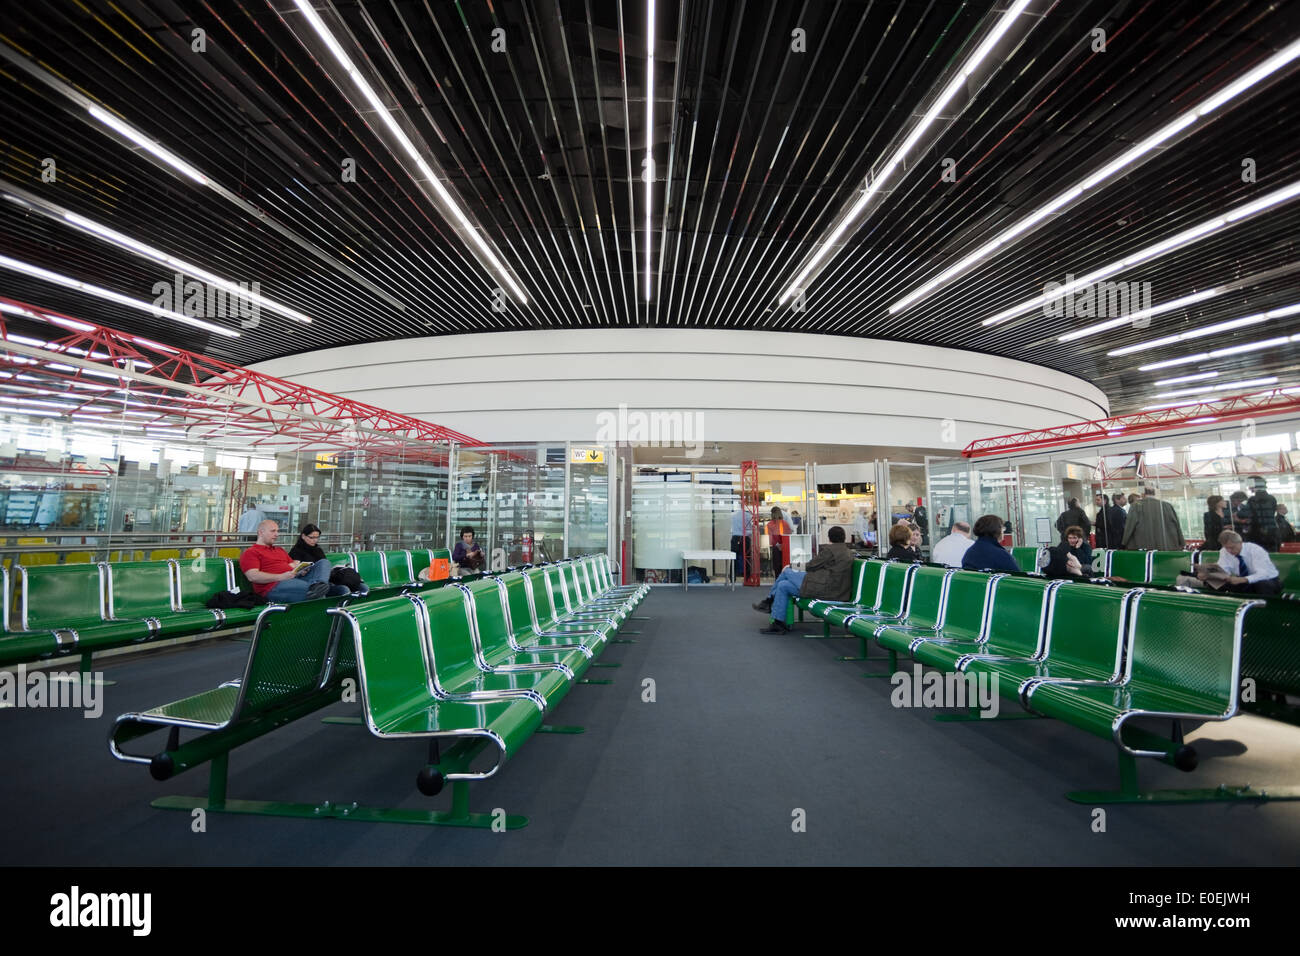 Wartebereich am Flughafen - Waiting area on an Airport Stock Photo